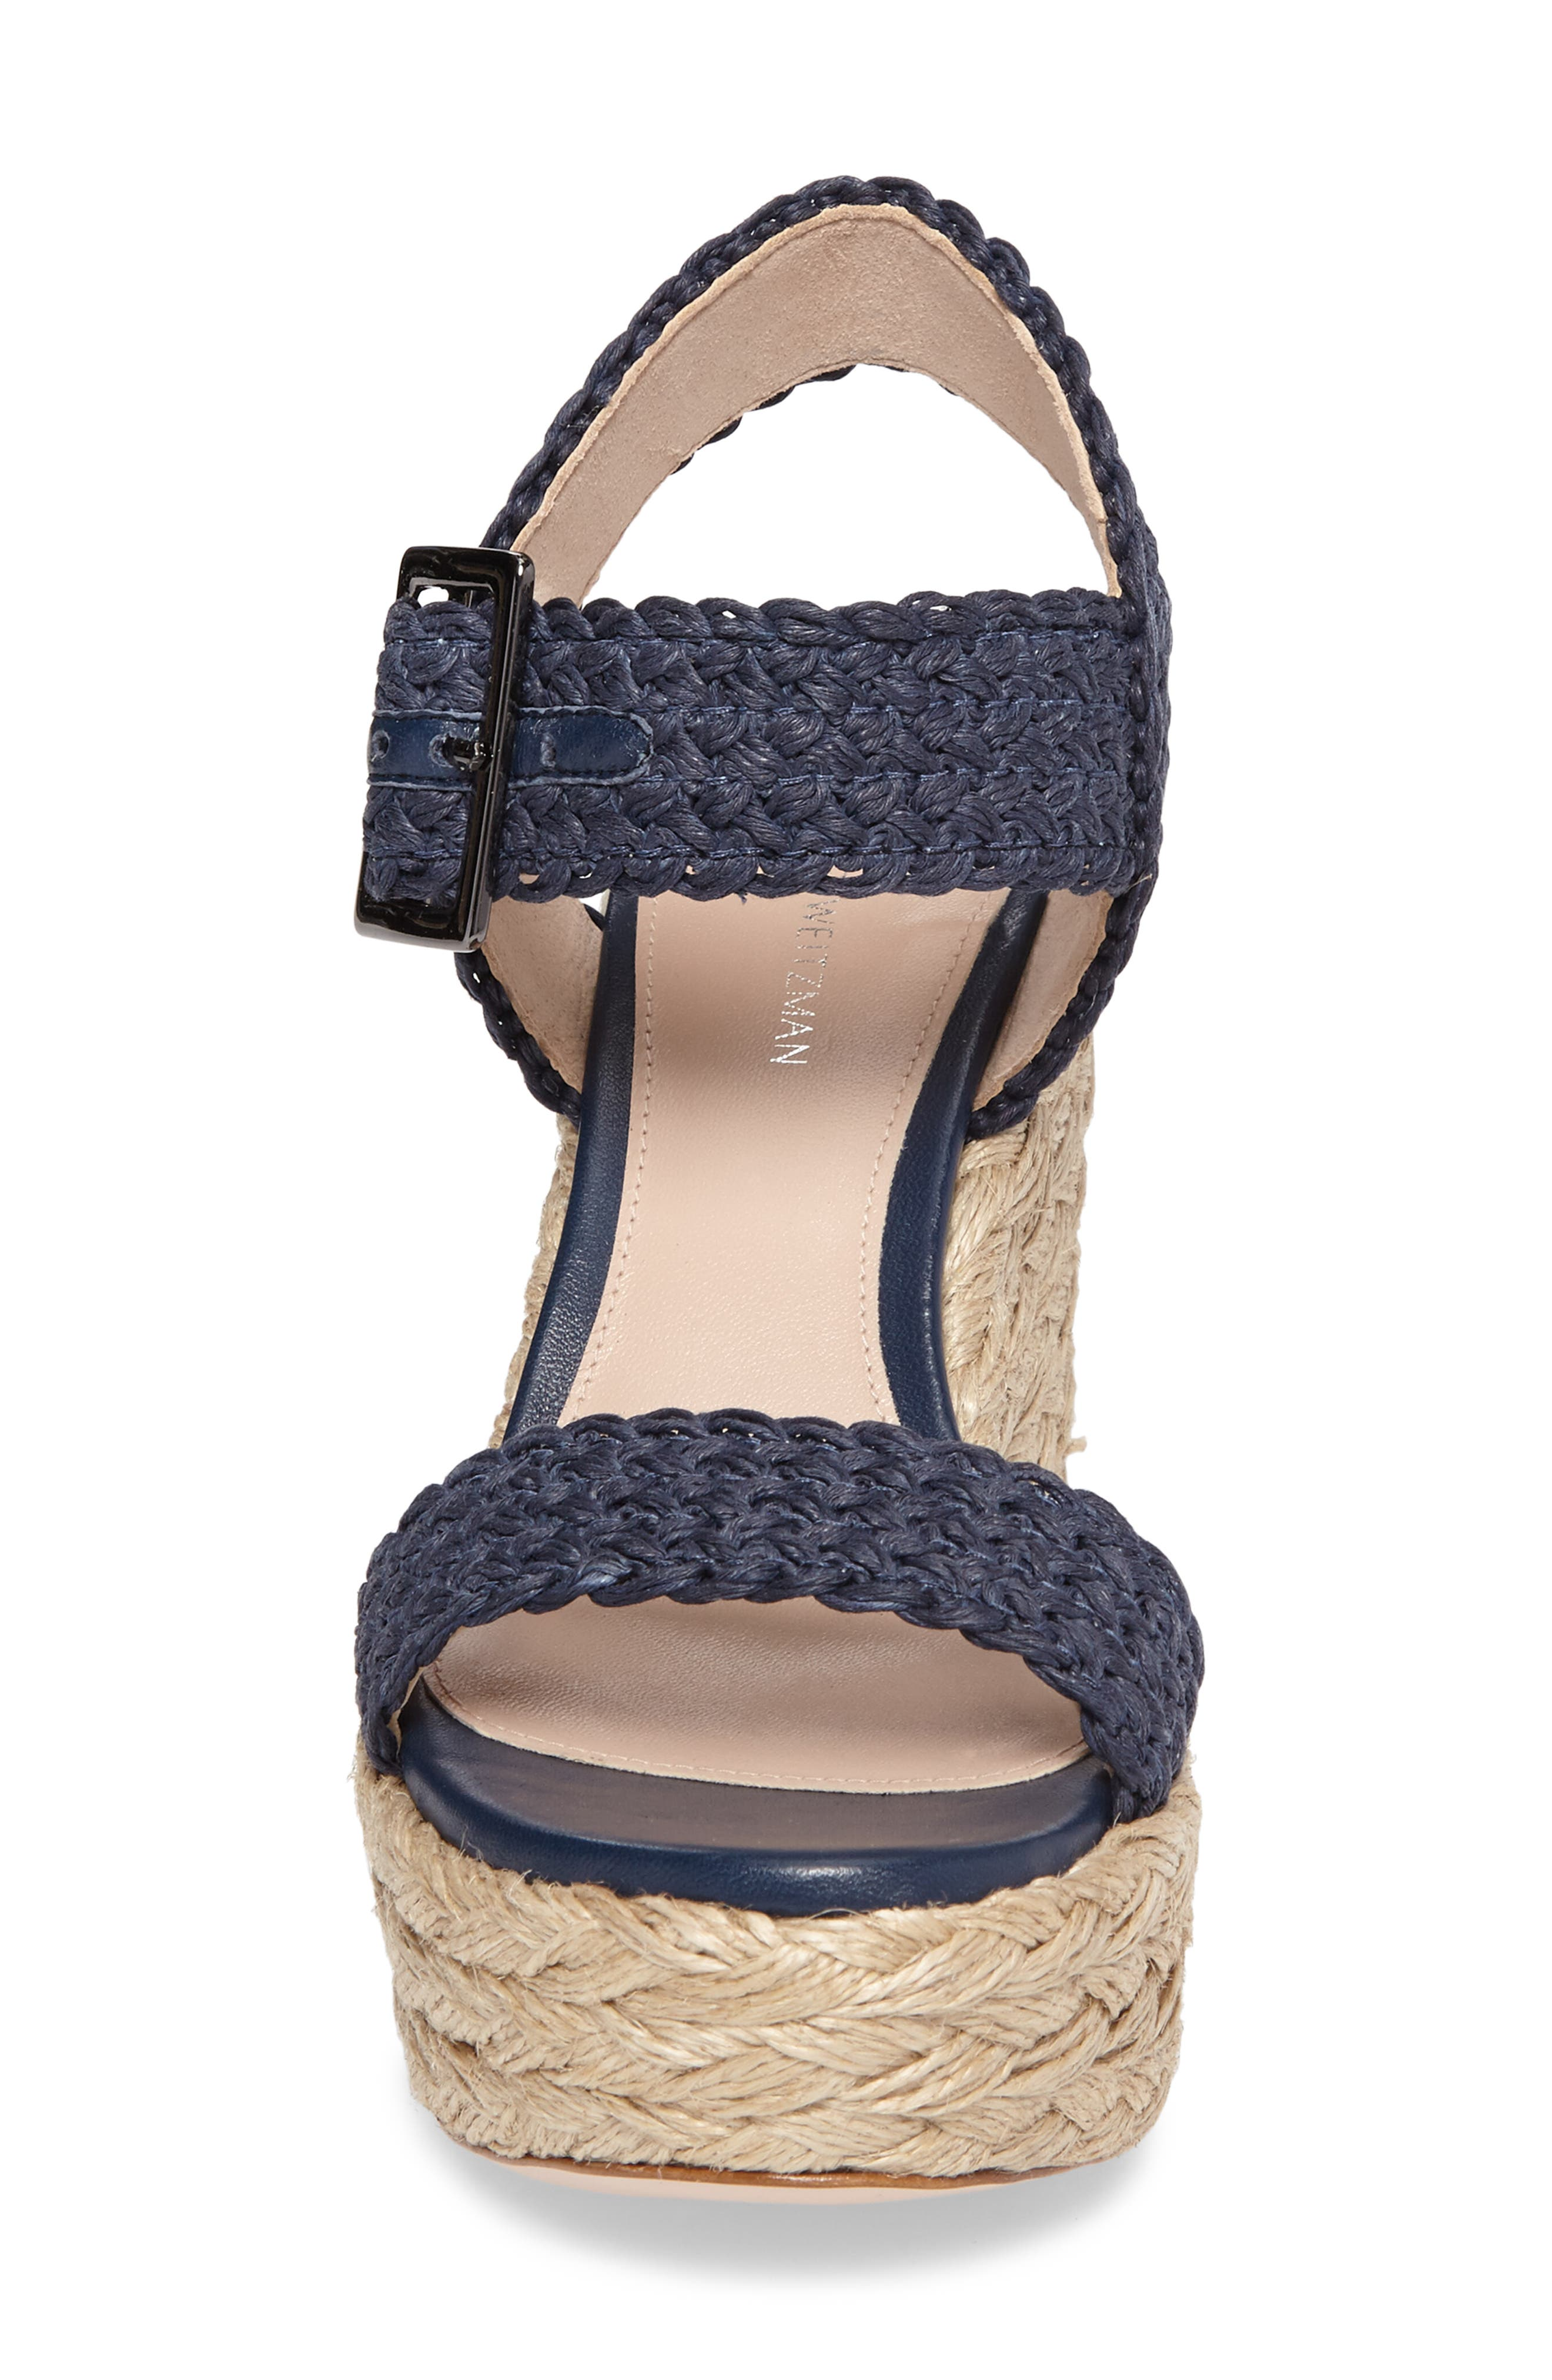 Alexis Espadrille Platform Wedge,                             Alternate thumbnail 4, color,                             Nice Blue Crochet